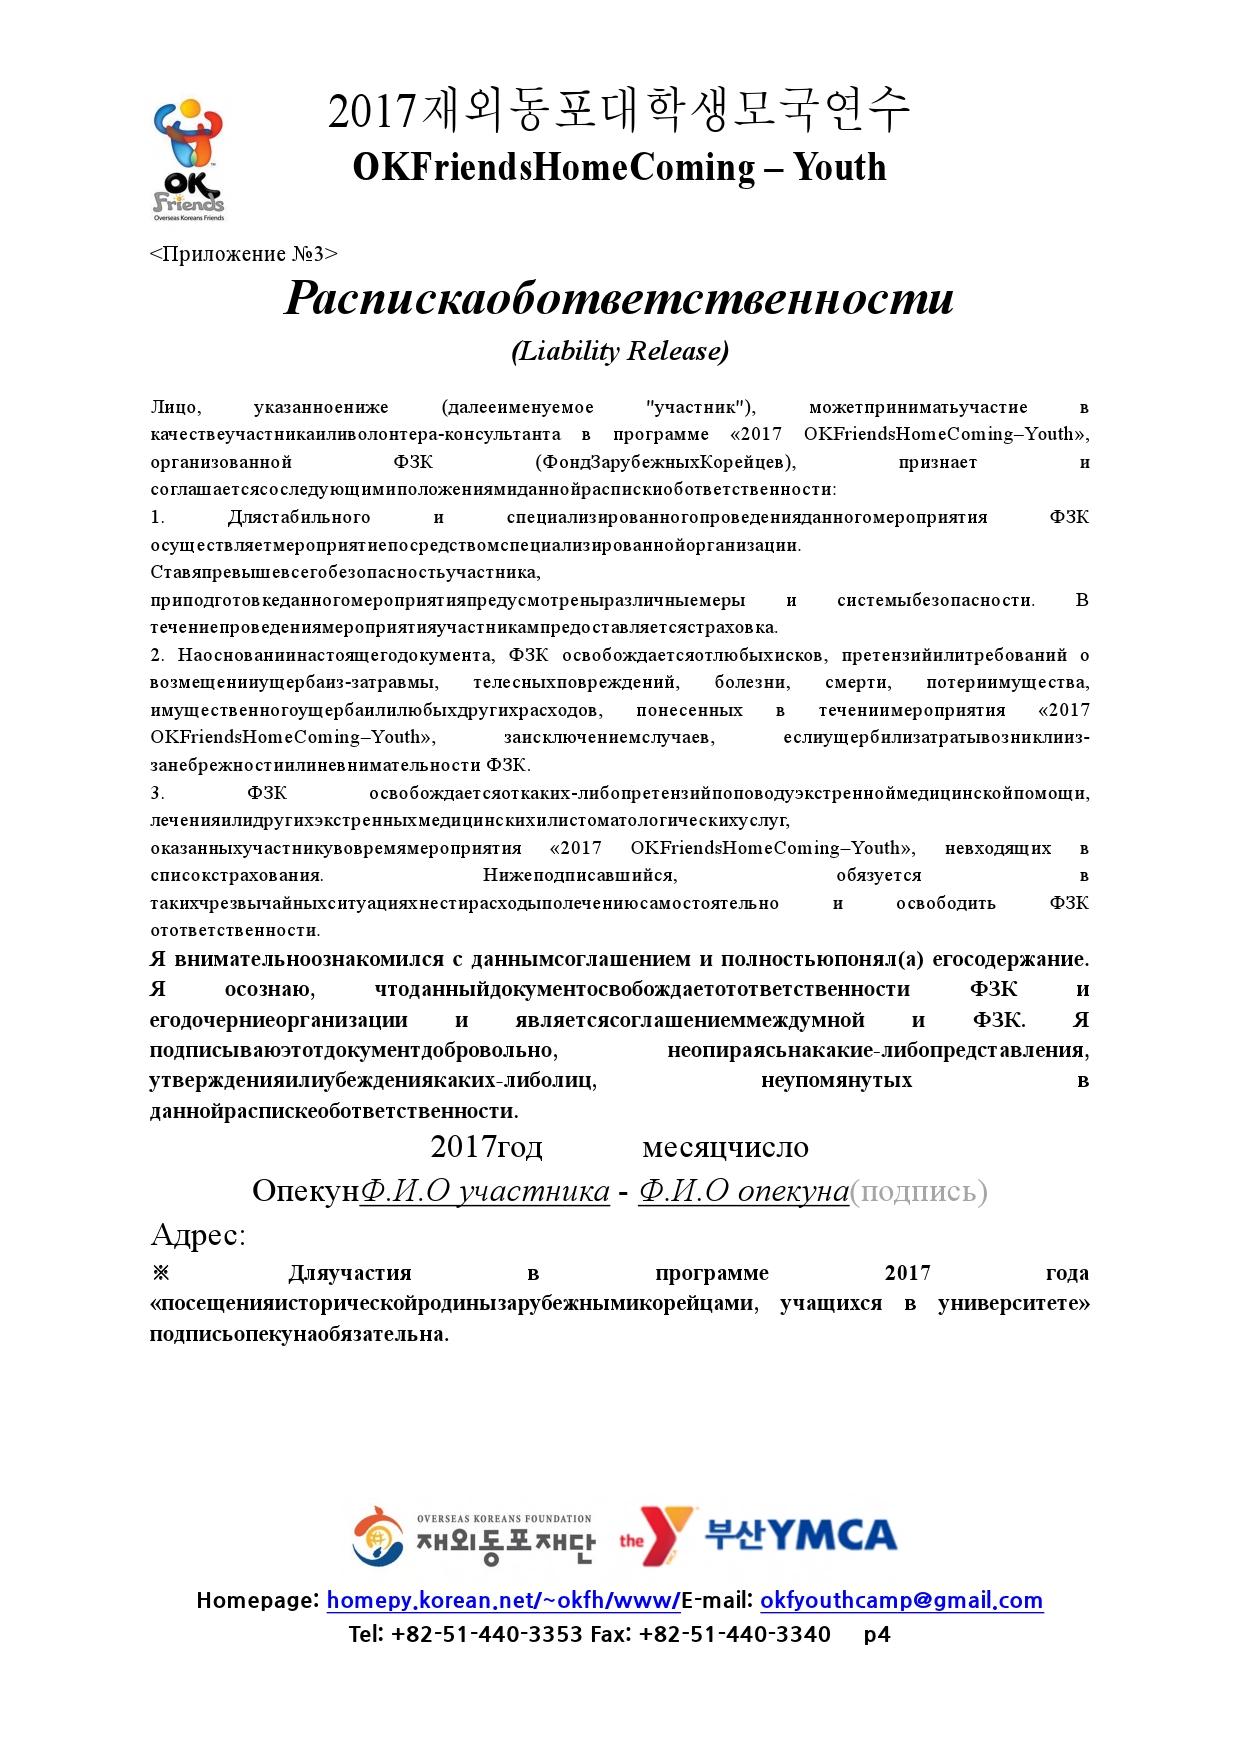 2017_OKF_YOUTH_INFO_1_RUS_1-4.jpg